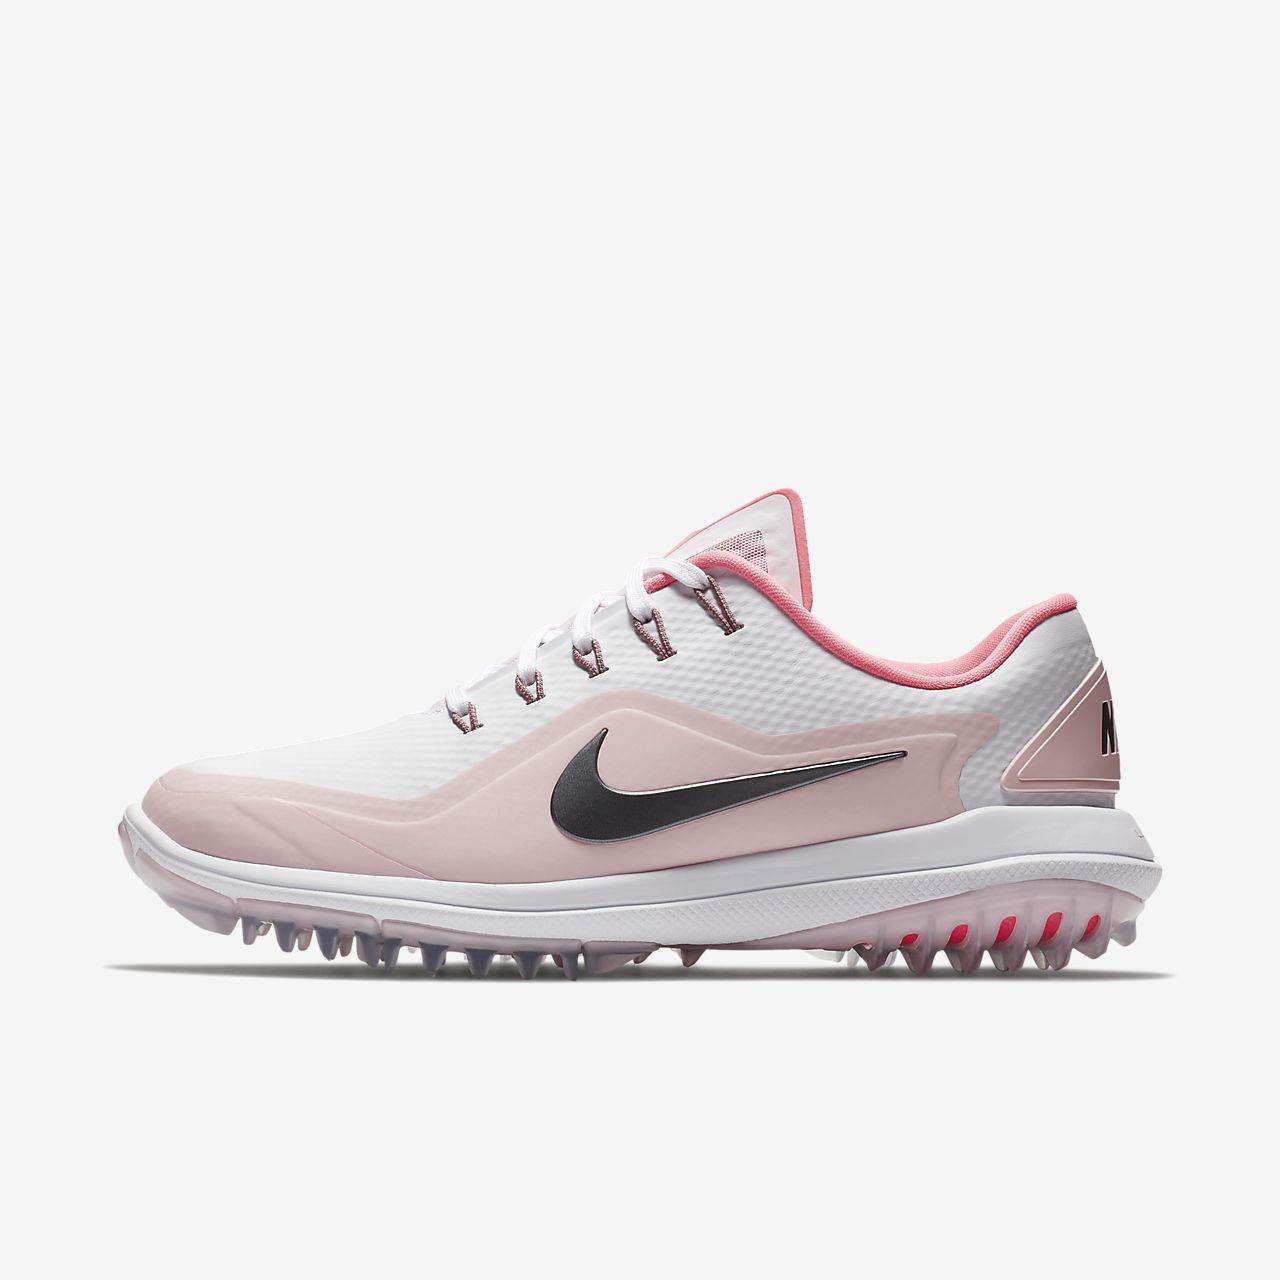 Nike Lunarglid 2 Shoes Women Size 9.5